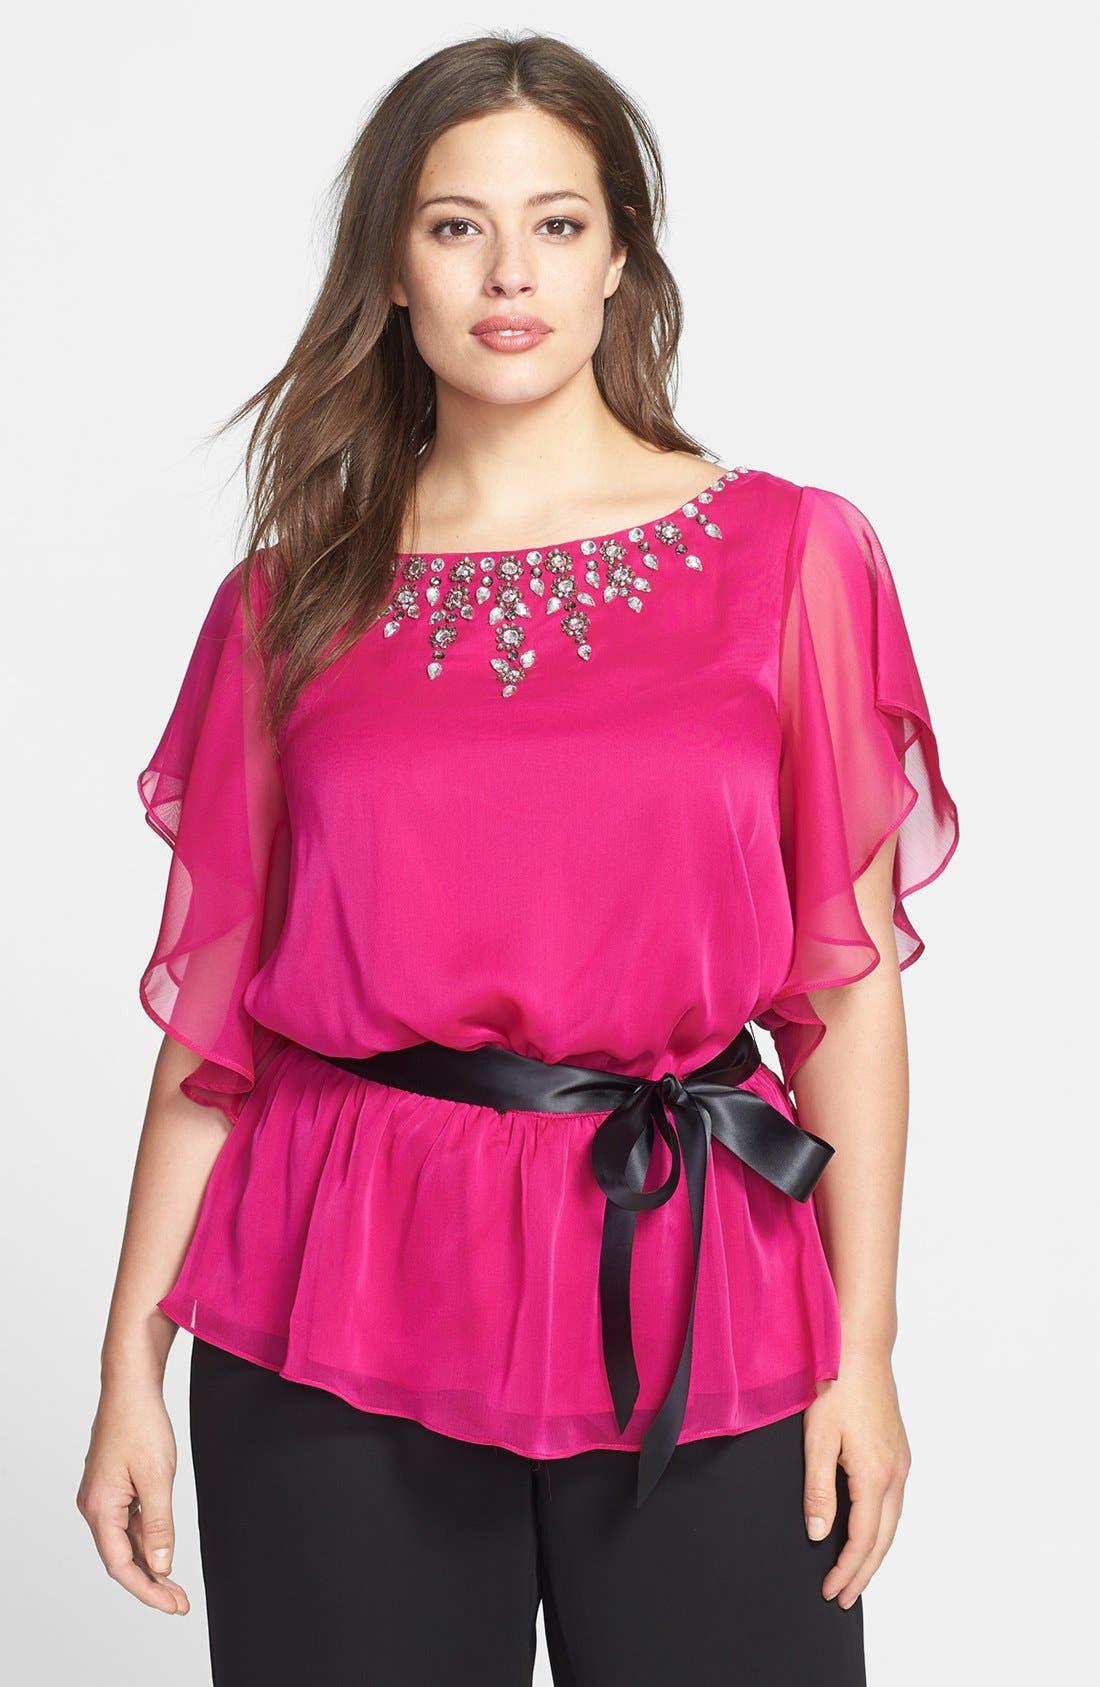 Alternate Image 1 Selected - Adrianna Papell Jeweled Chiffon Blouse (Plus Size)